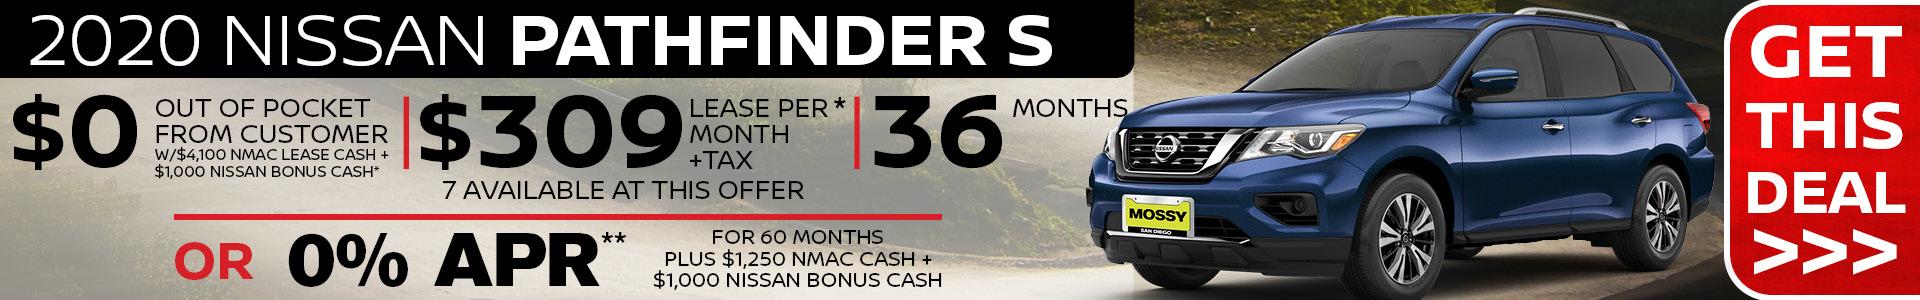 Mossy Nissan - Pathfinder SRP